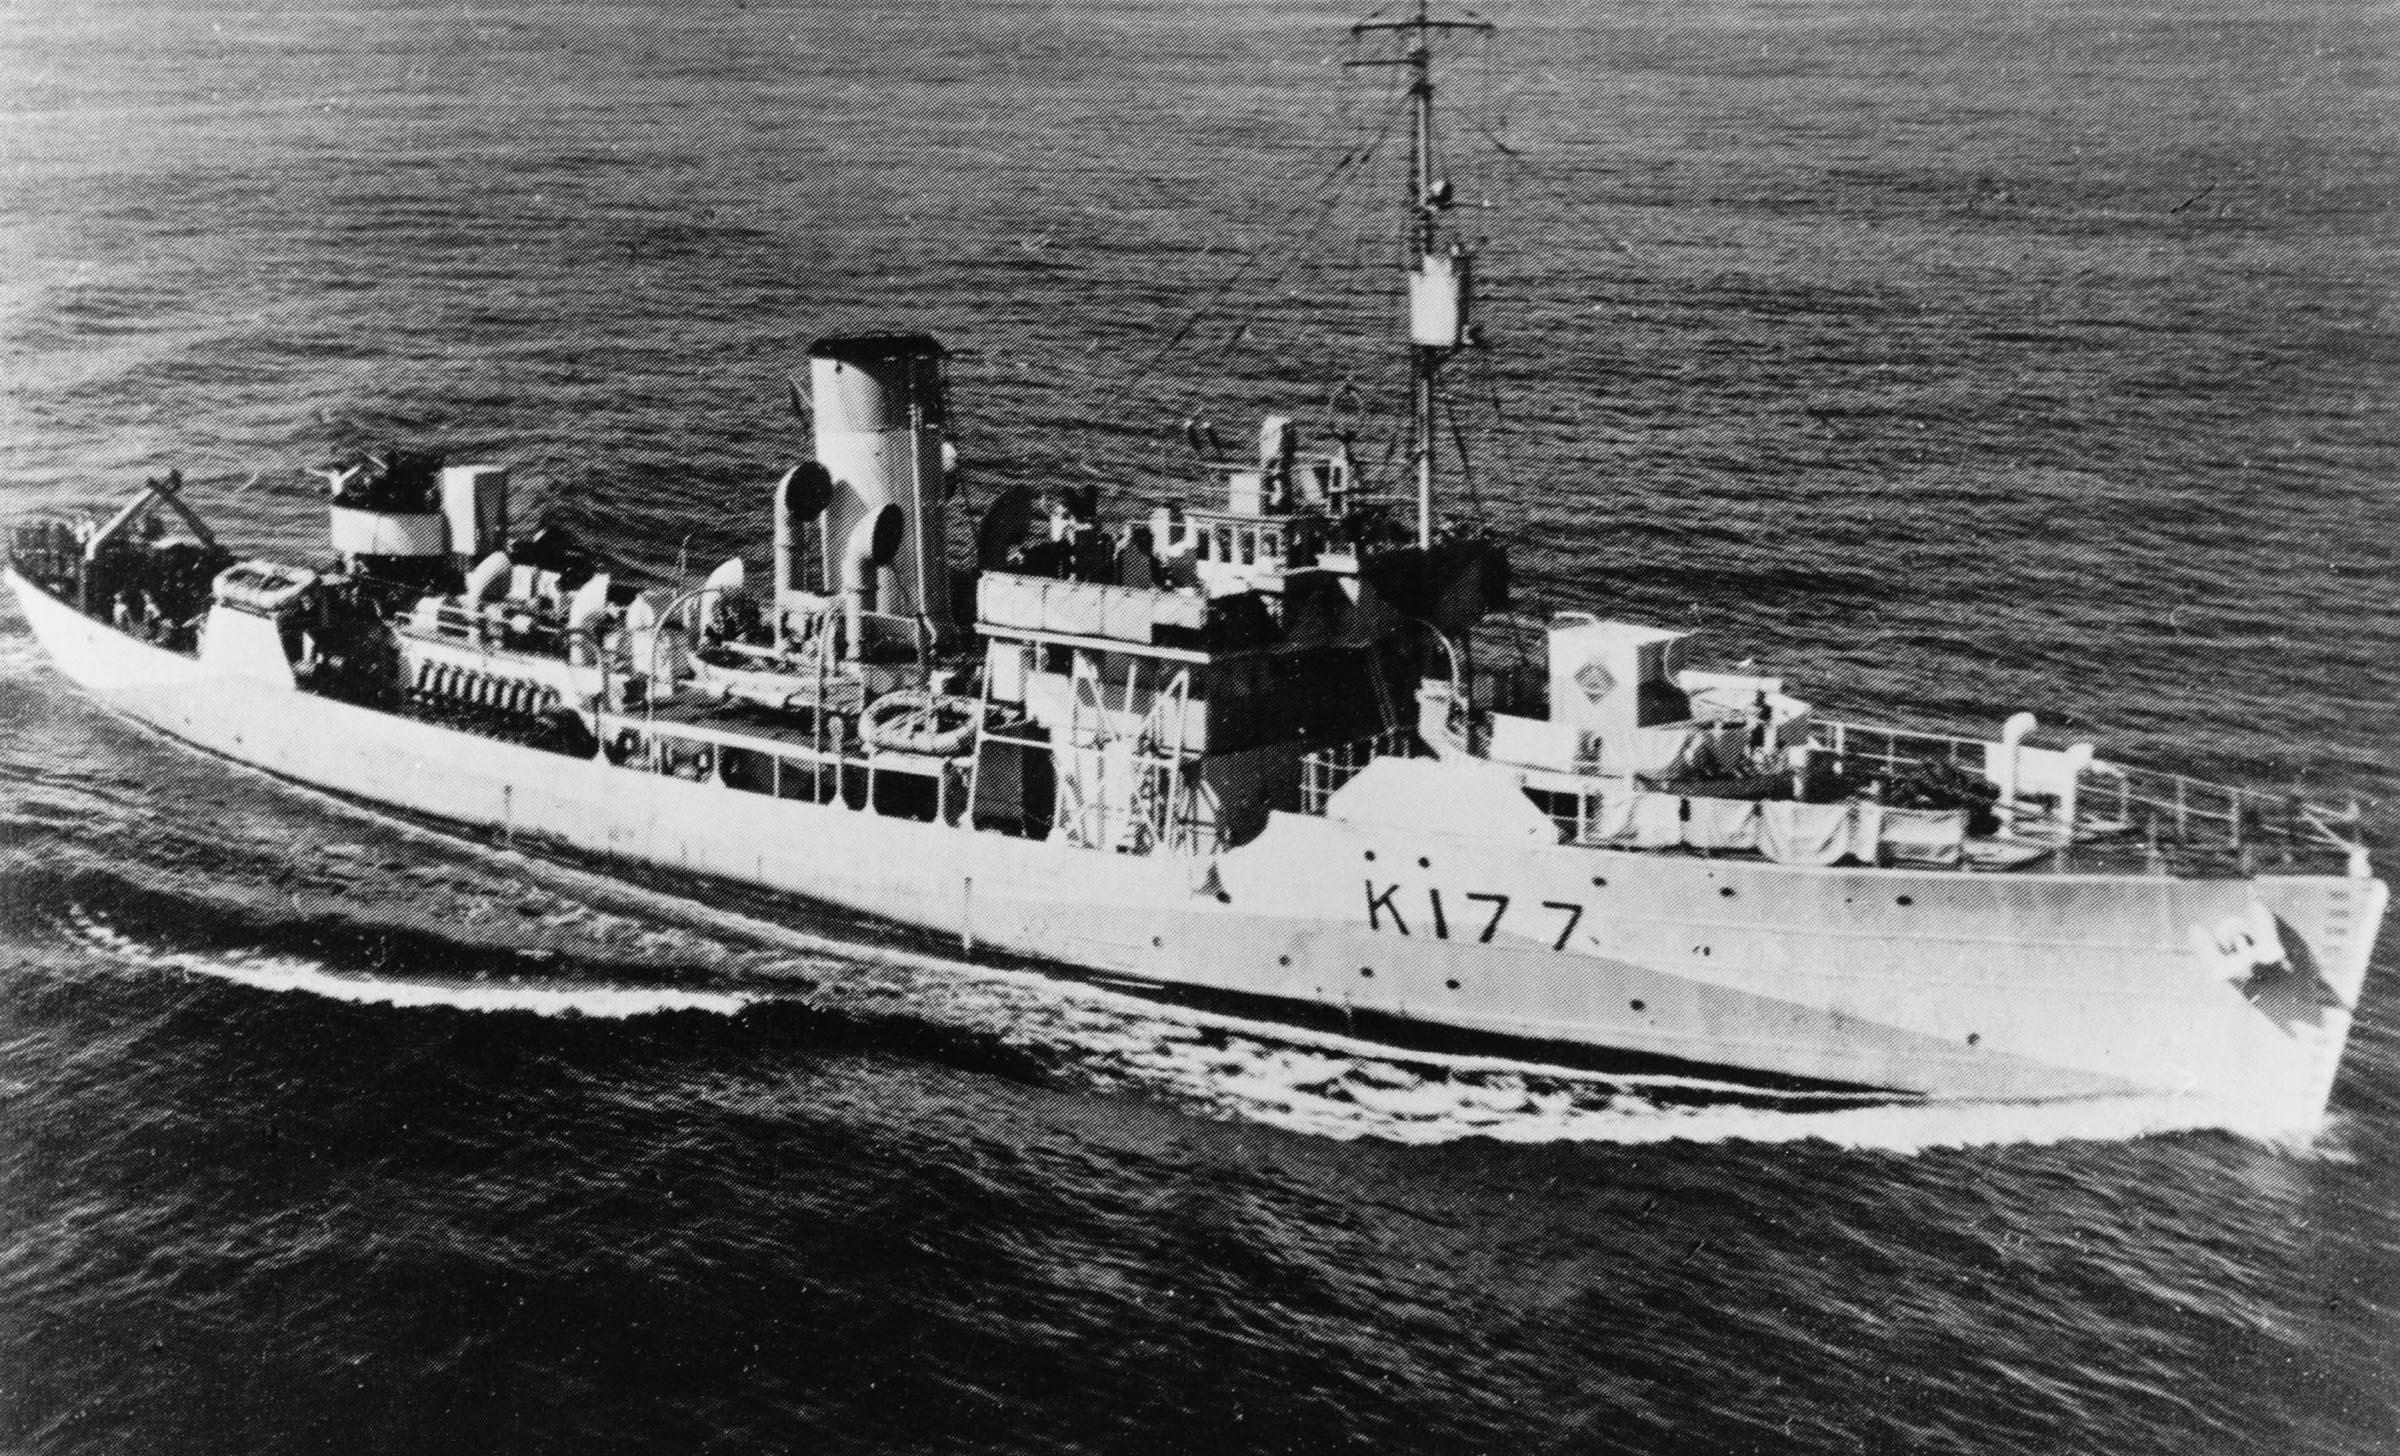 HMCS DUNVEGAN